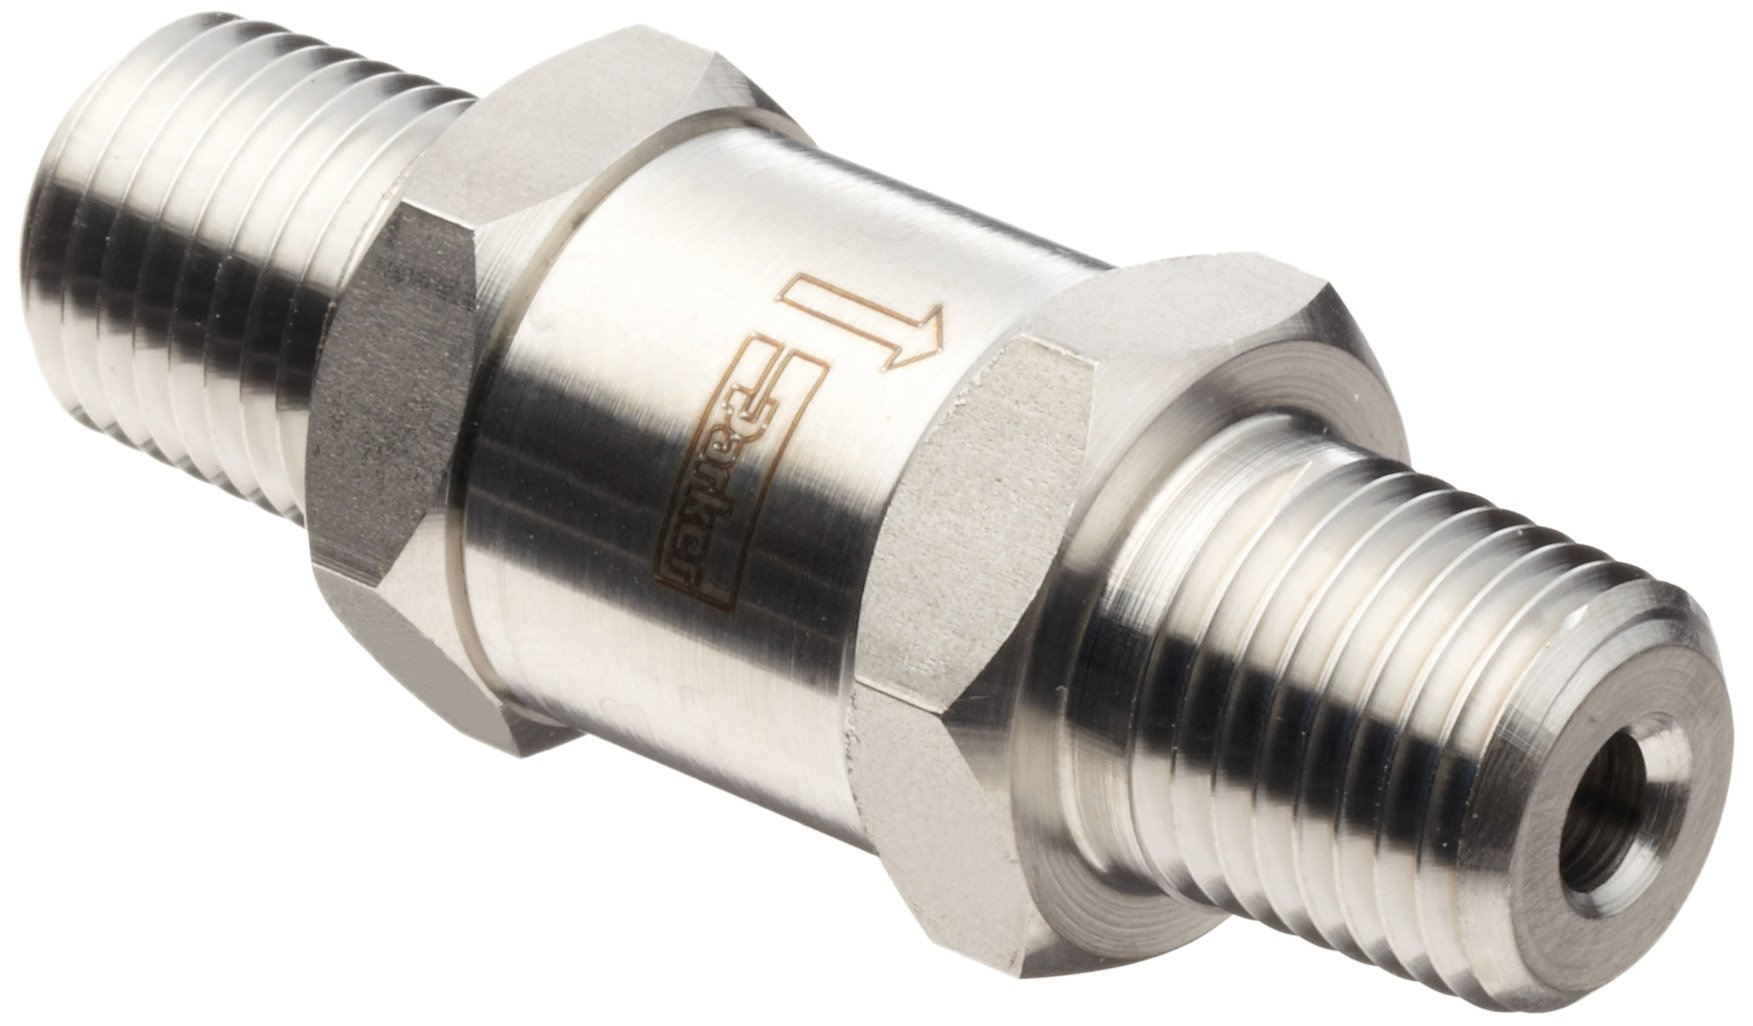 Parker F Series Stainless Steel 316 Instrumentation Filter, Inline, 50 Micron, 3/4'' NPT Male